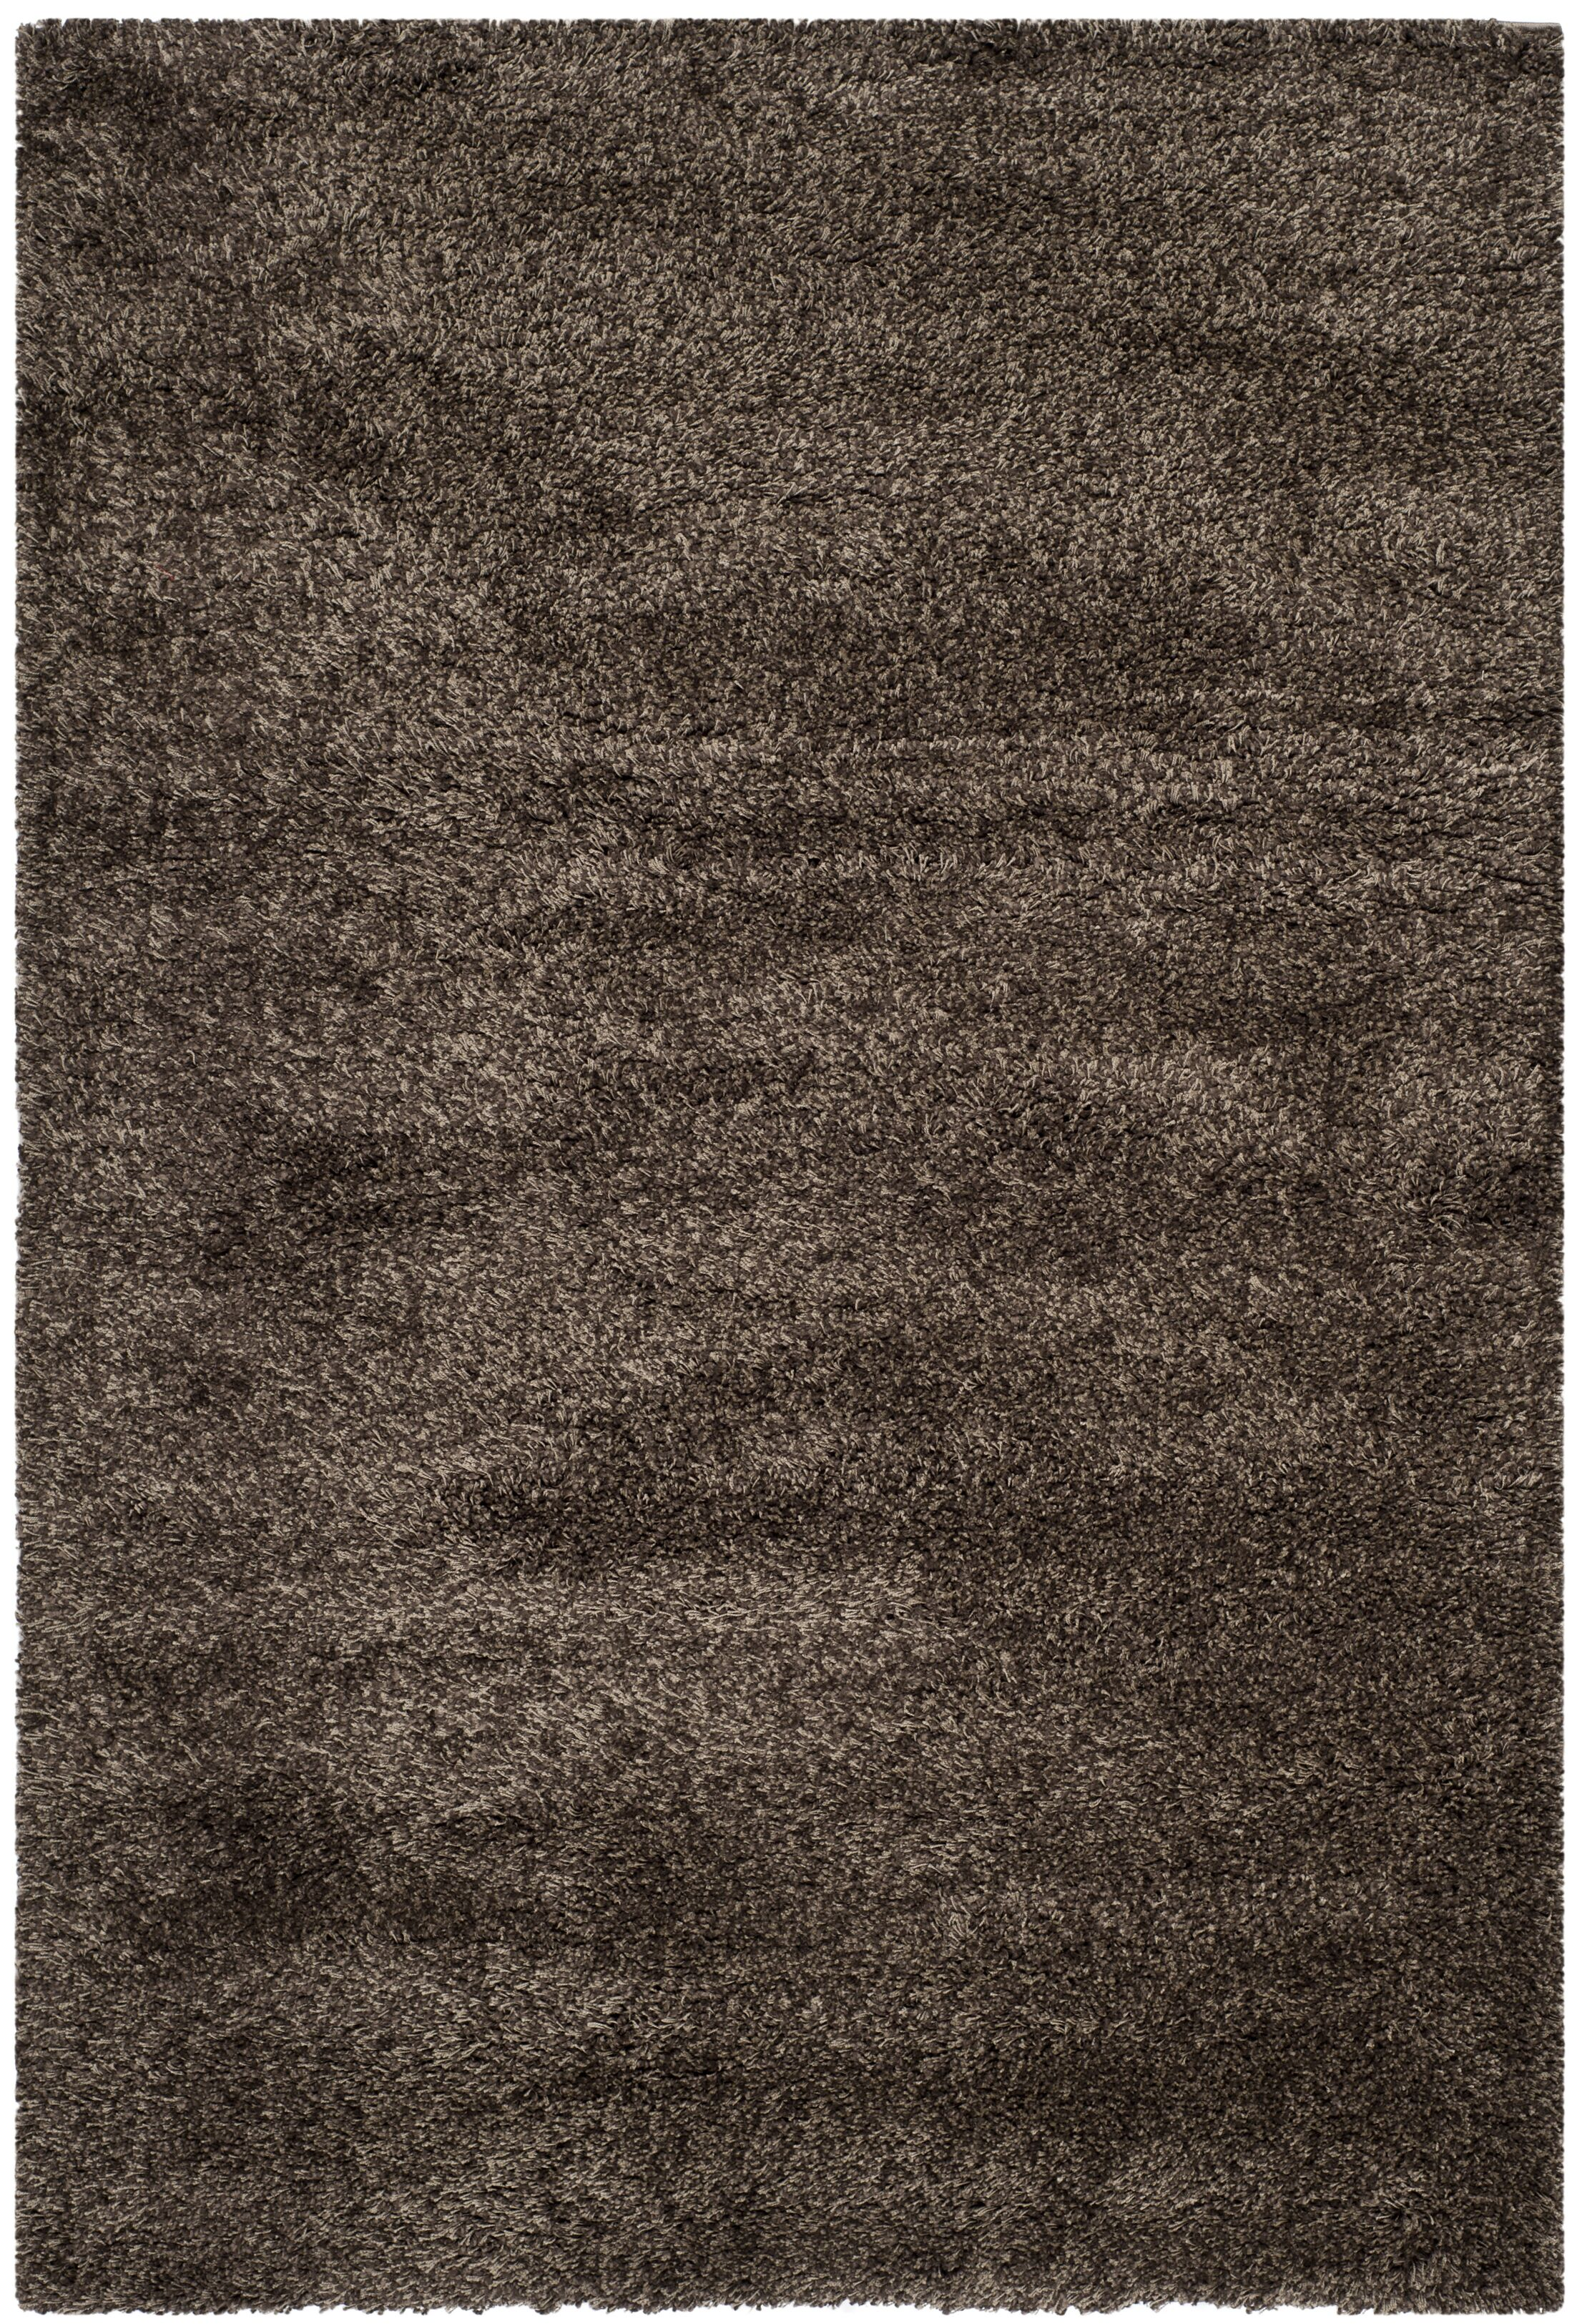 Blakeley Mushroom Area Rug Rug Size: Rectangle 4' x 6'